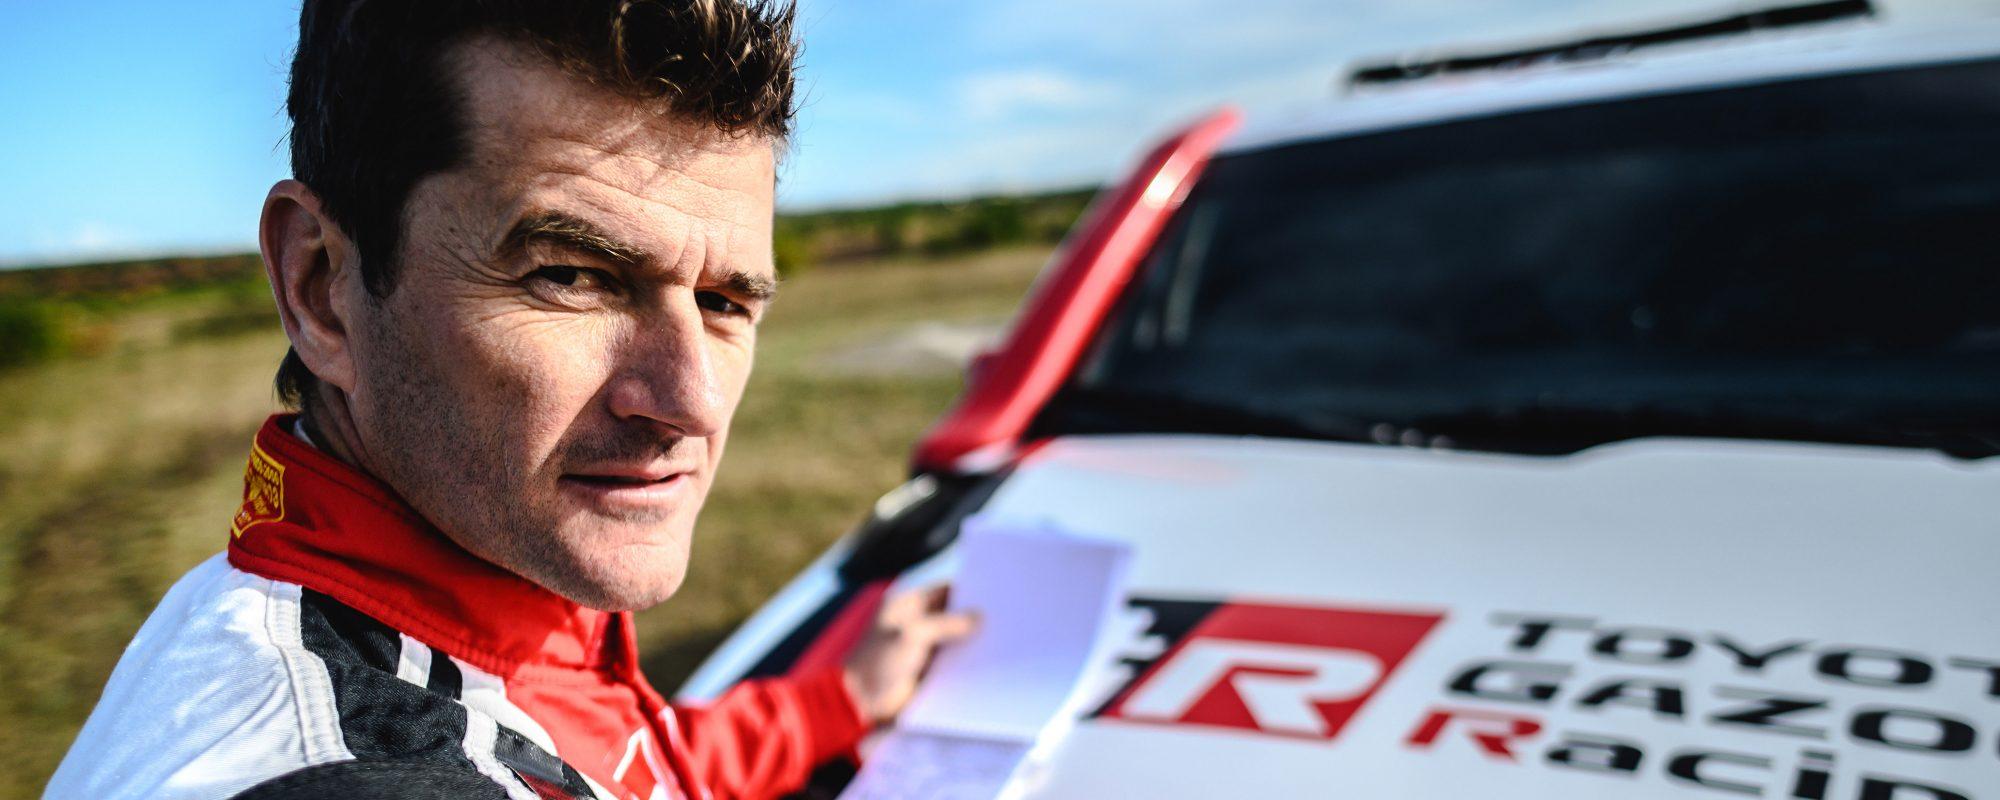 Dakar-veteraan Marc Coma navigator van Fernando Alonso bij TOYOTA GAZOO Racing